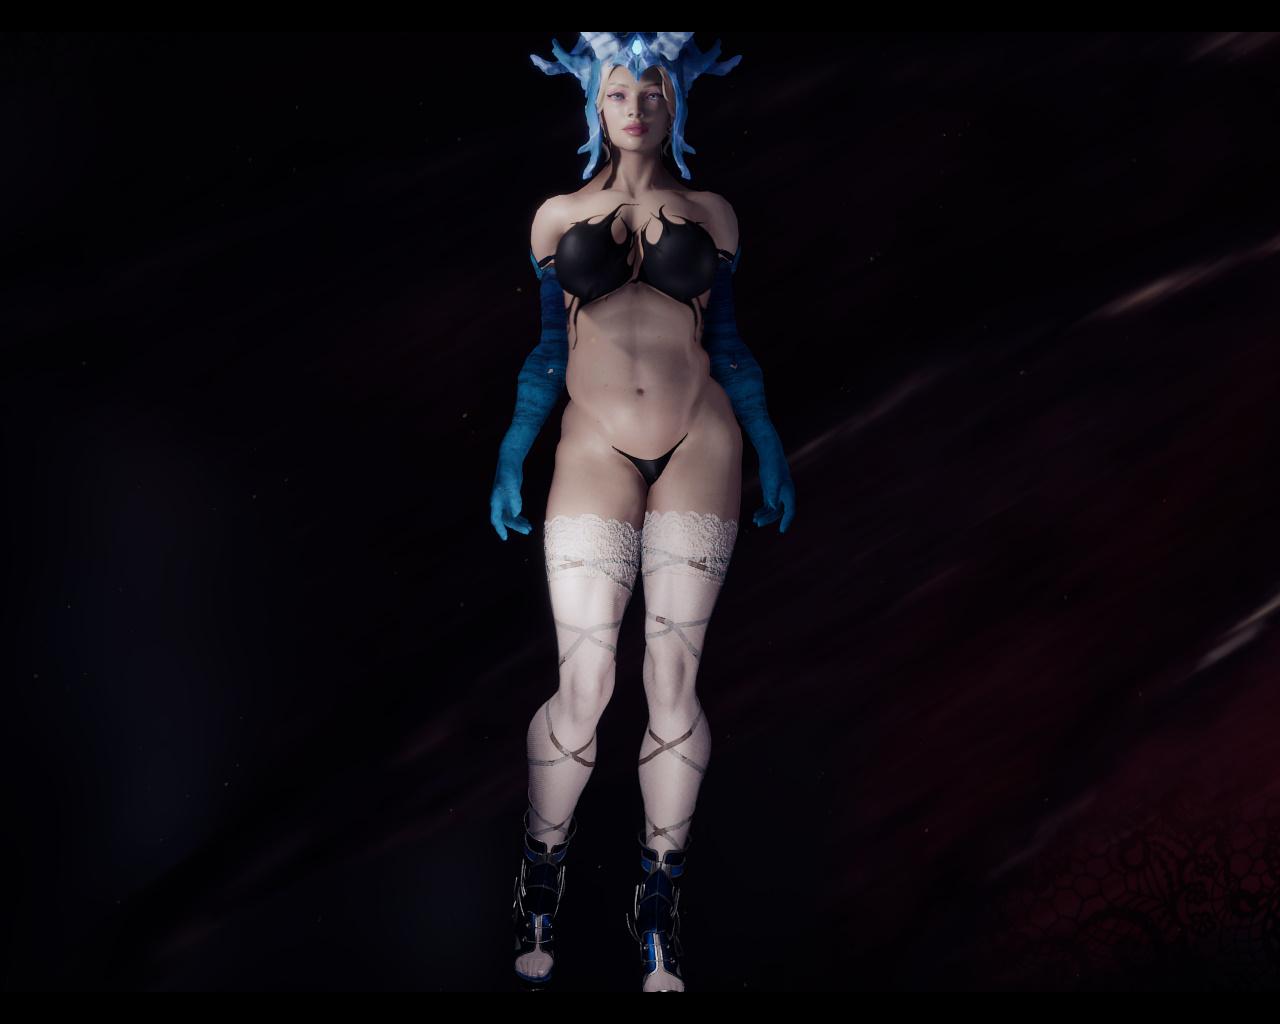 bandicam 2021-07-31 18-39-18-632.jpg - She Will Punish Them